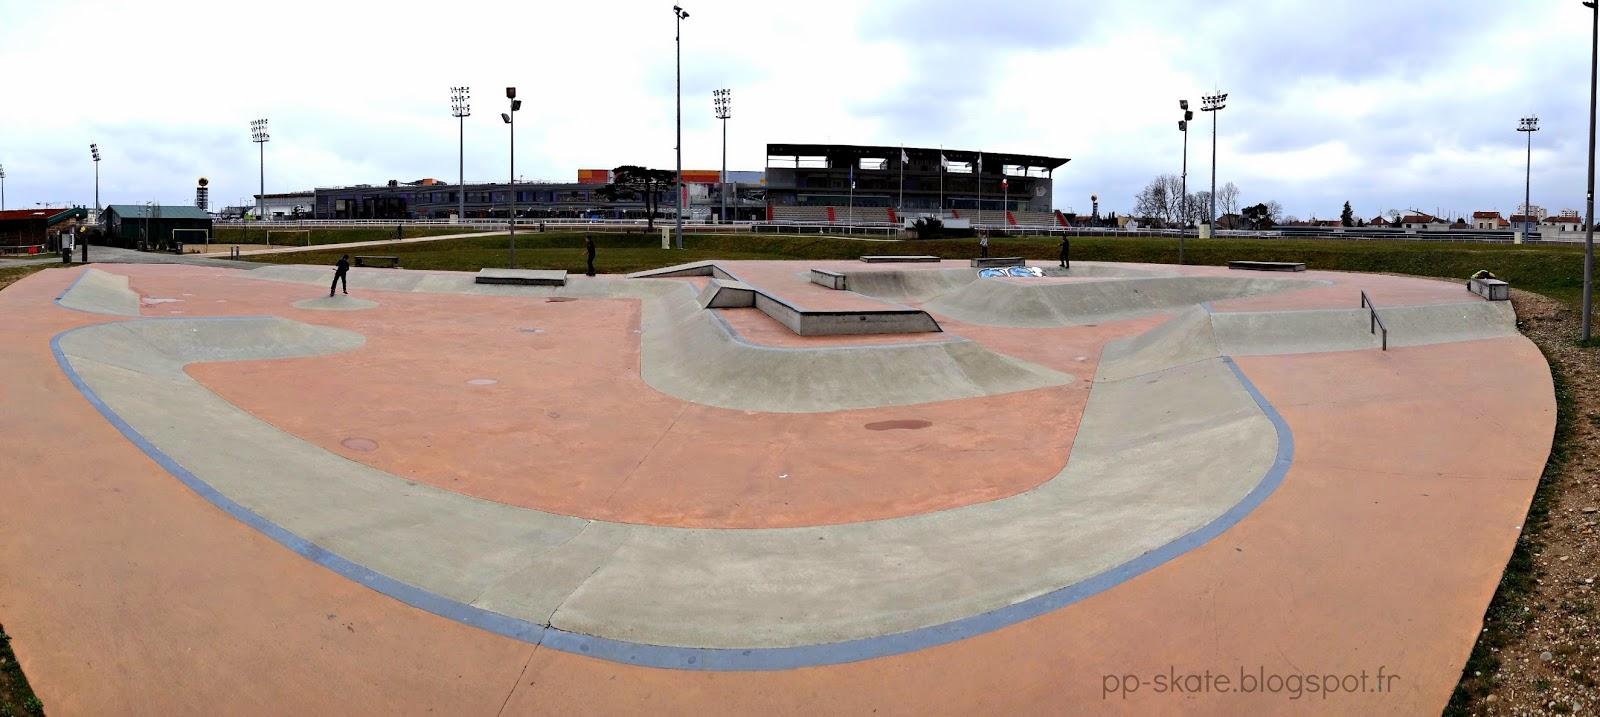 Skatepark Vaulx en velin Carré soie Lyon